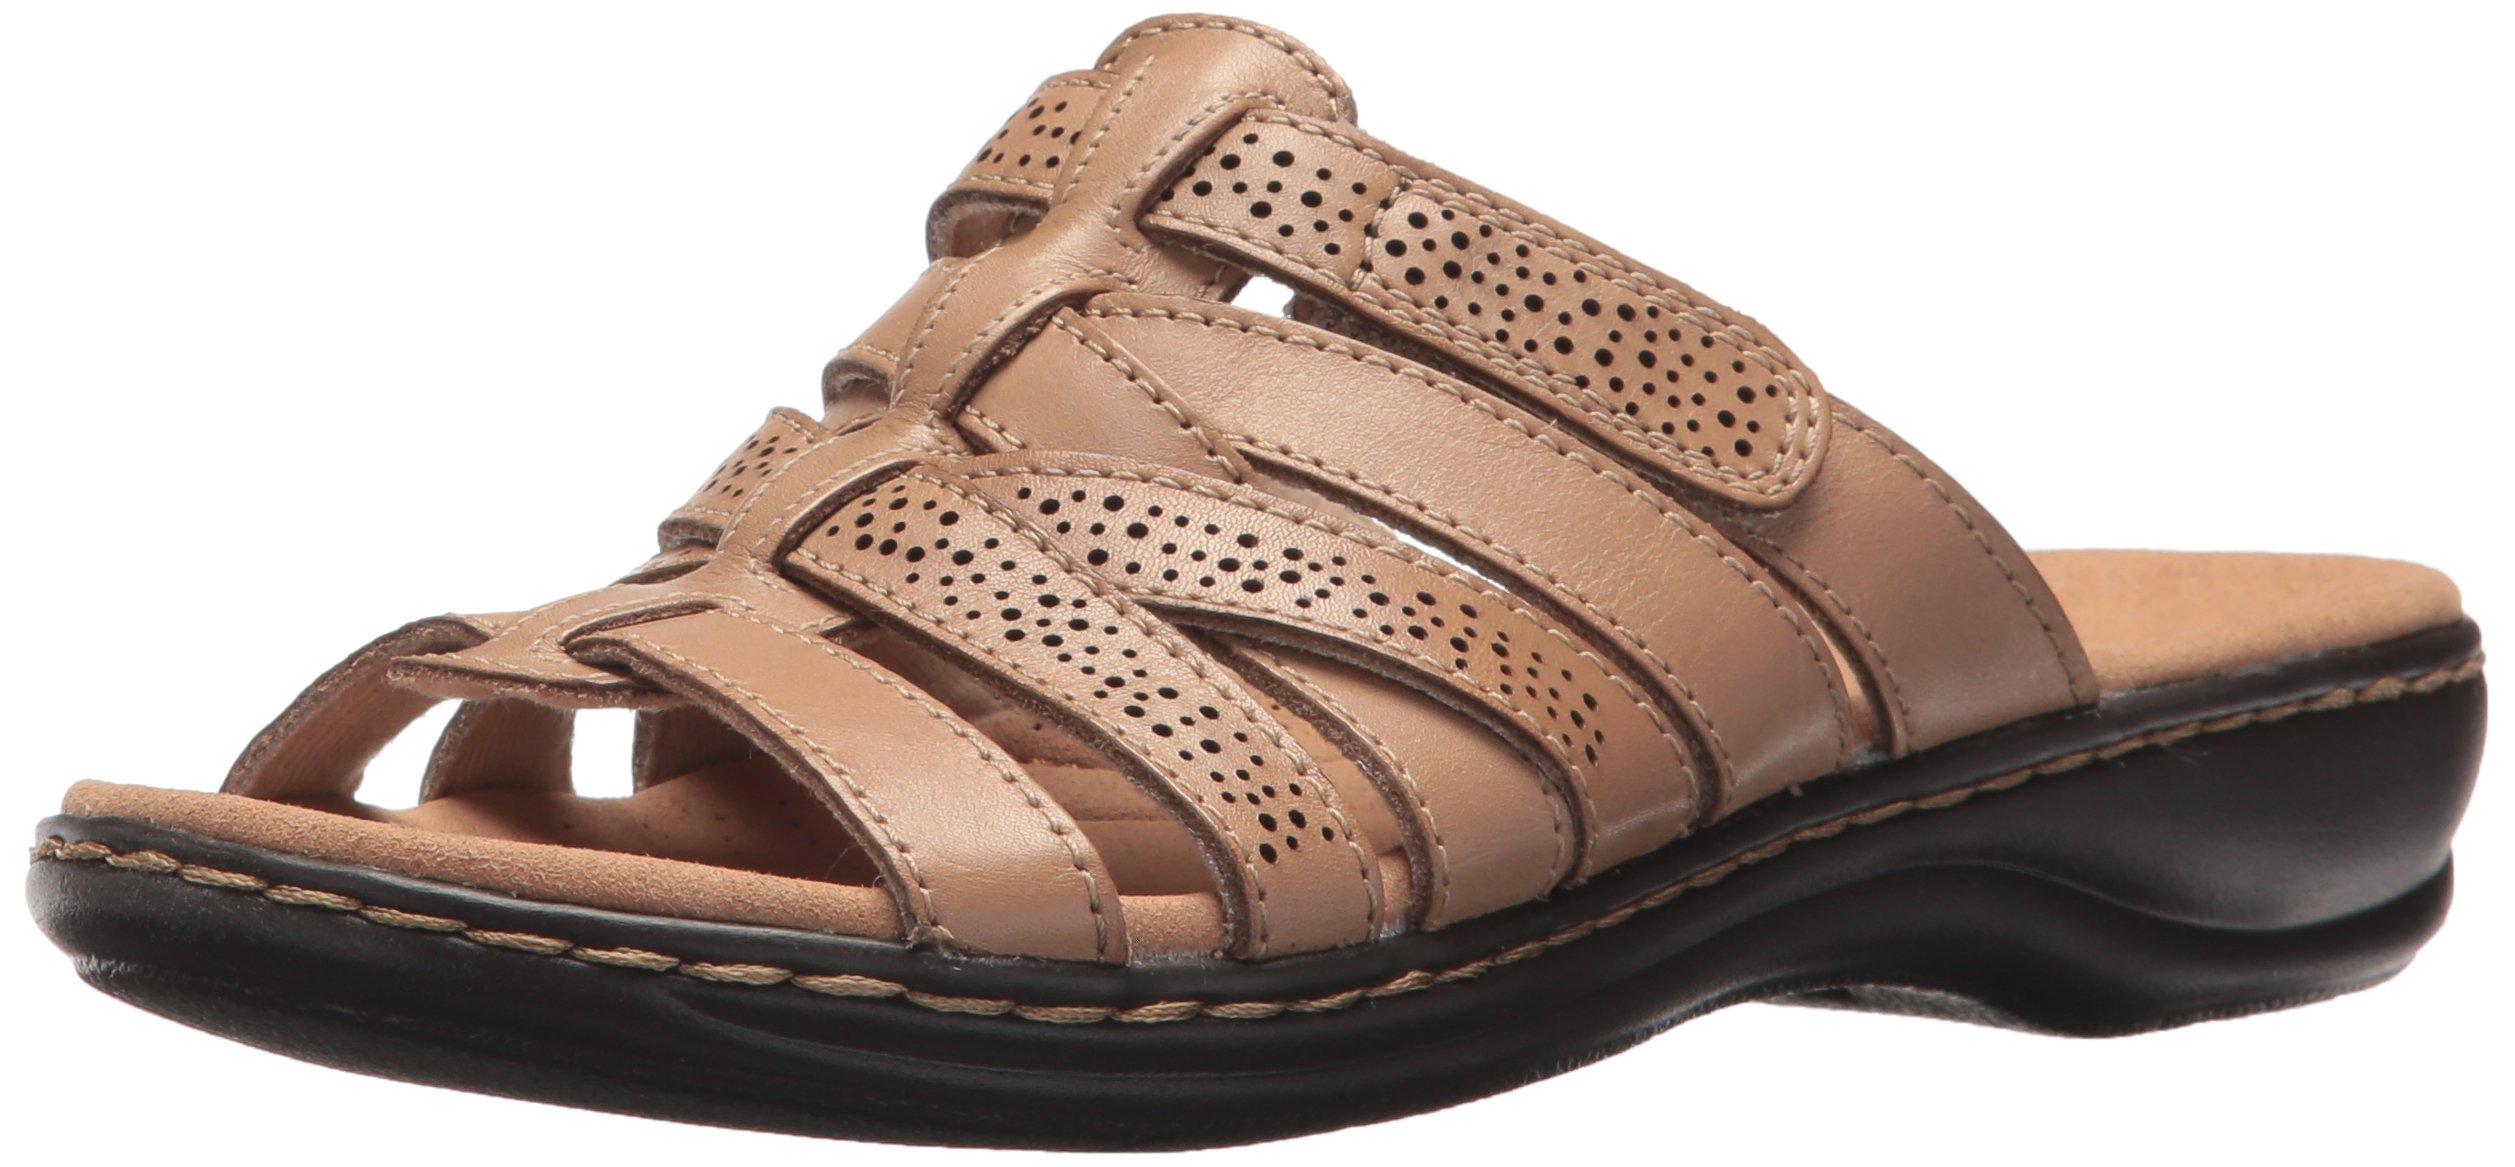 CLARKS Women's Leisa Field Platform, Sand Leather, 10 Medium US